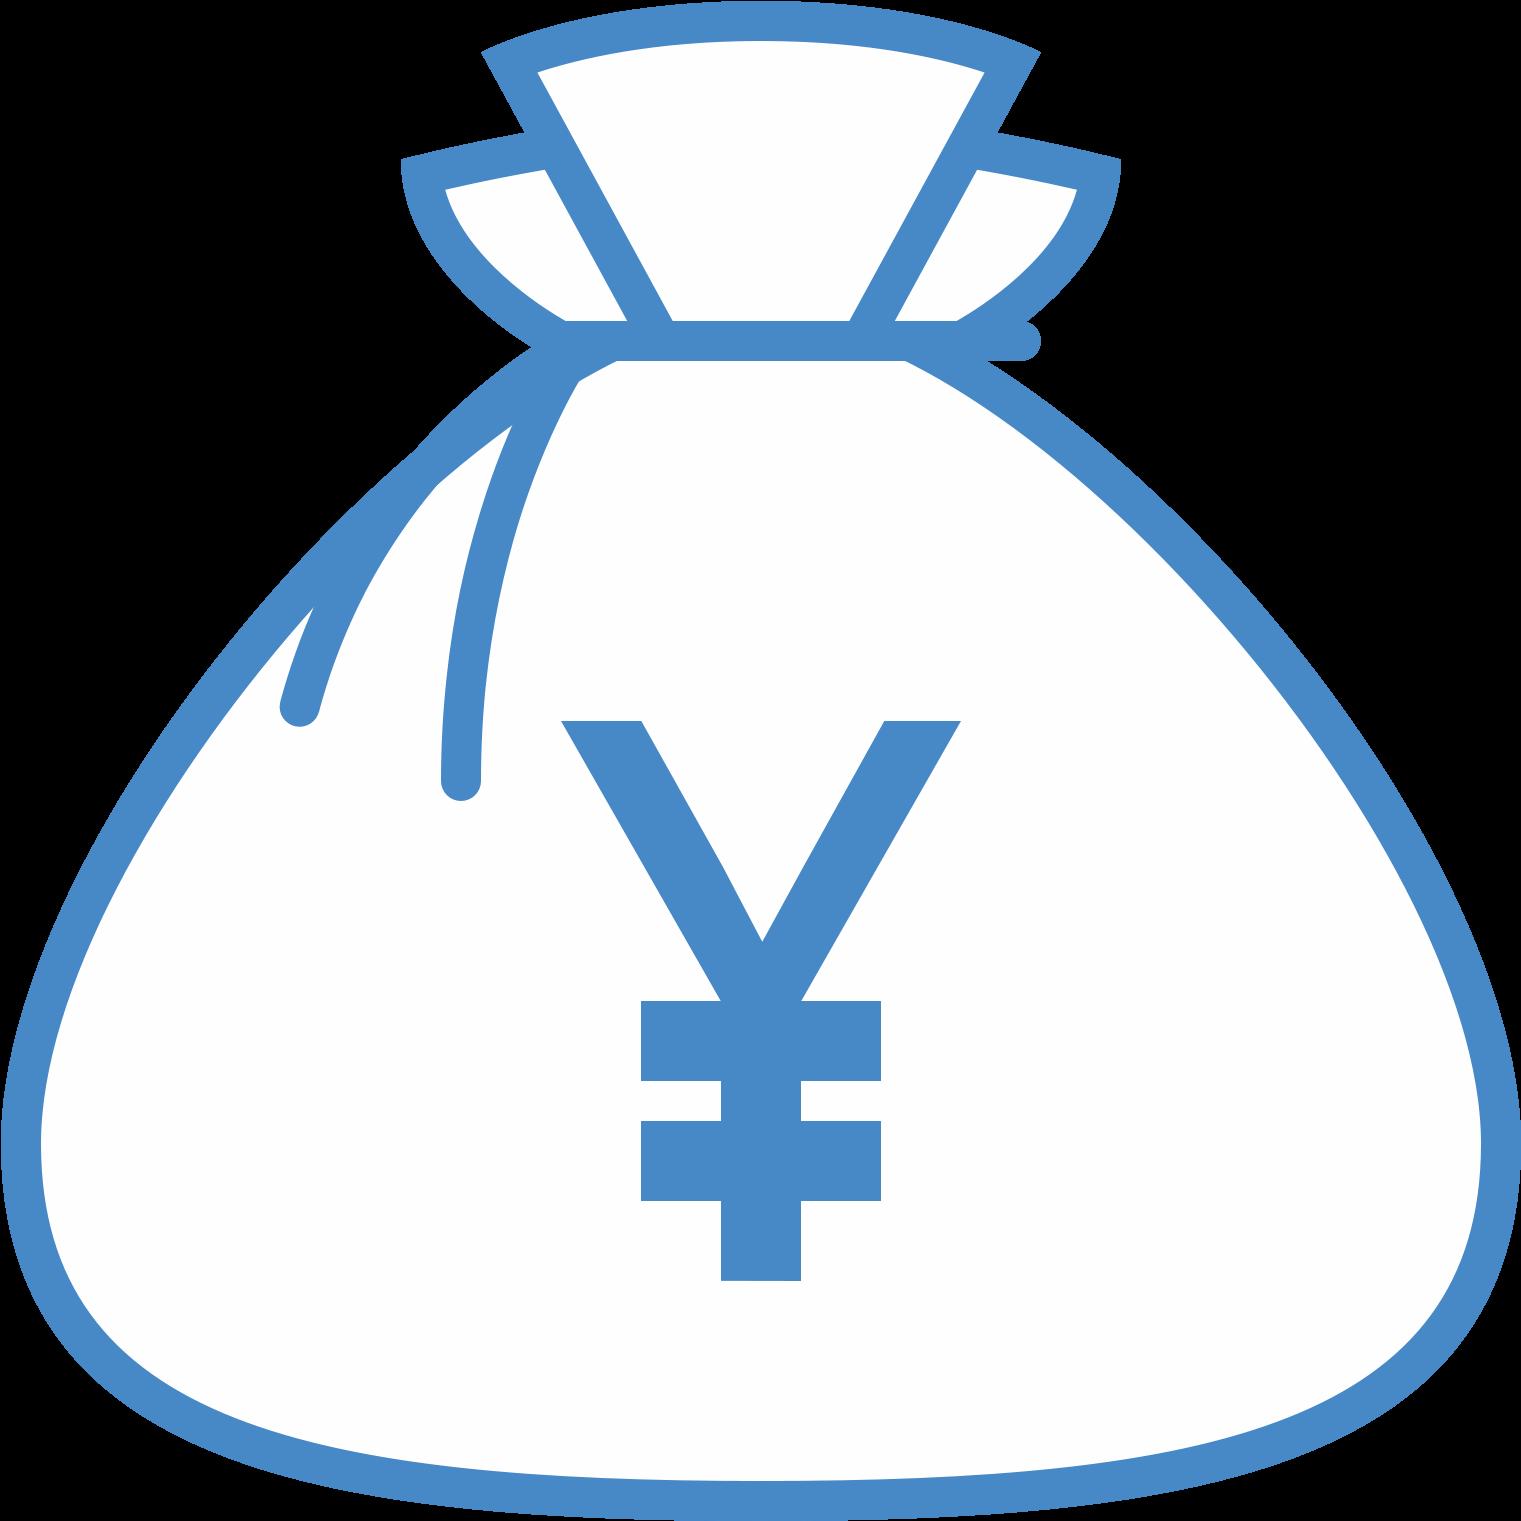 Bolsa De Dinero De Yenes Icon.